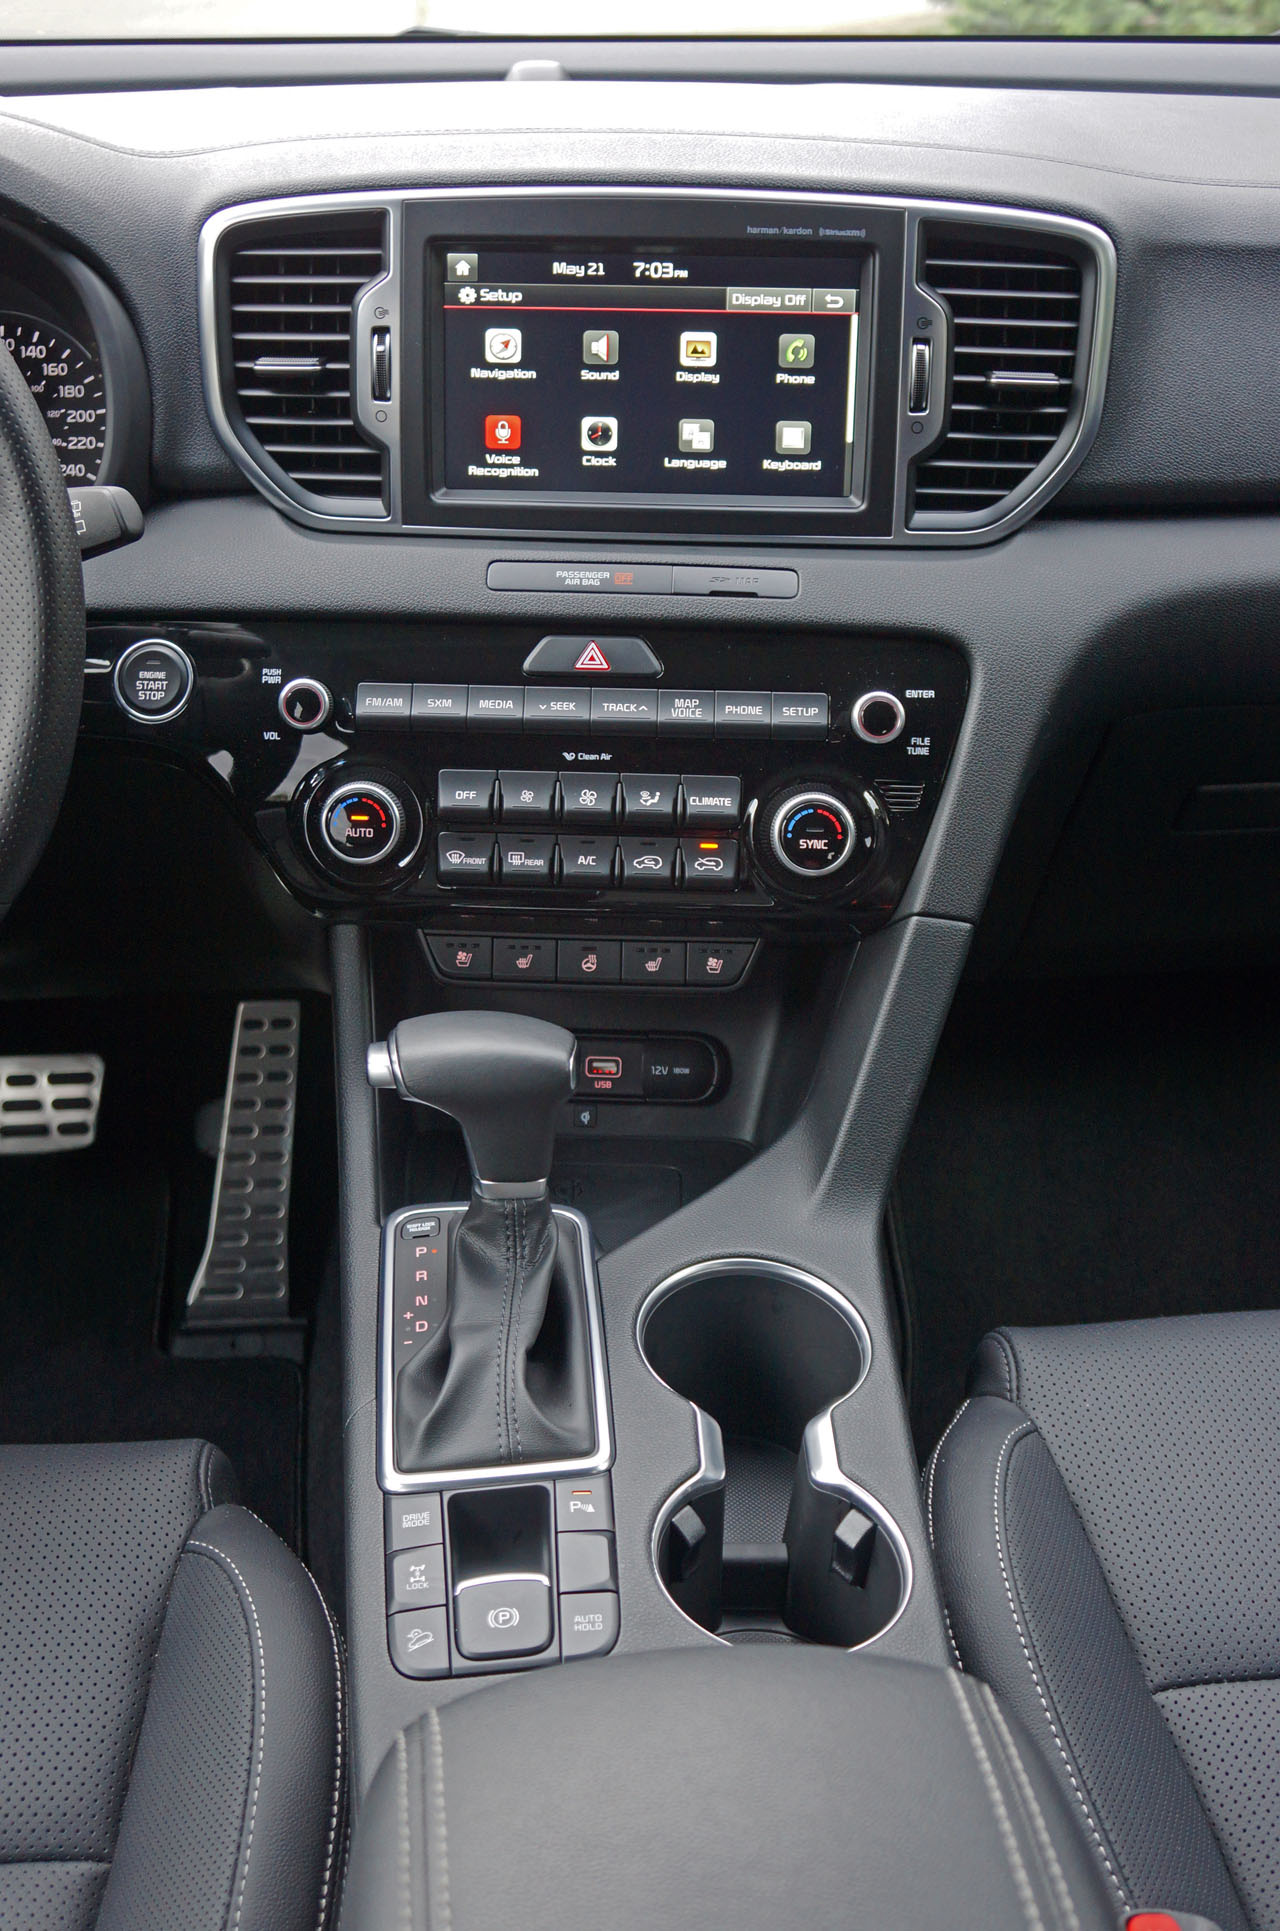 2017 Kia Sportage SX Road Test Review | CarCostCanada™